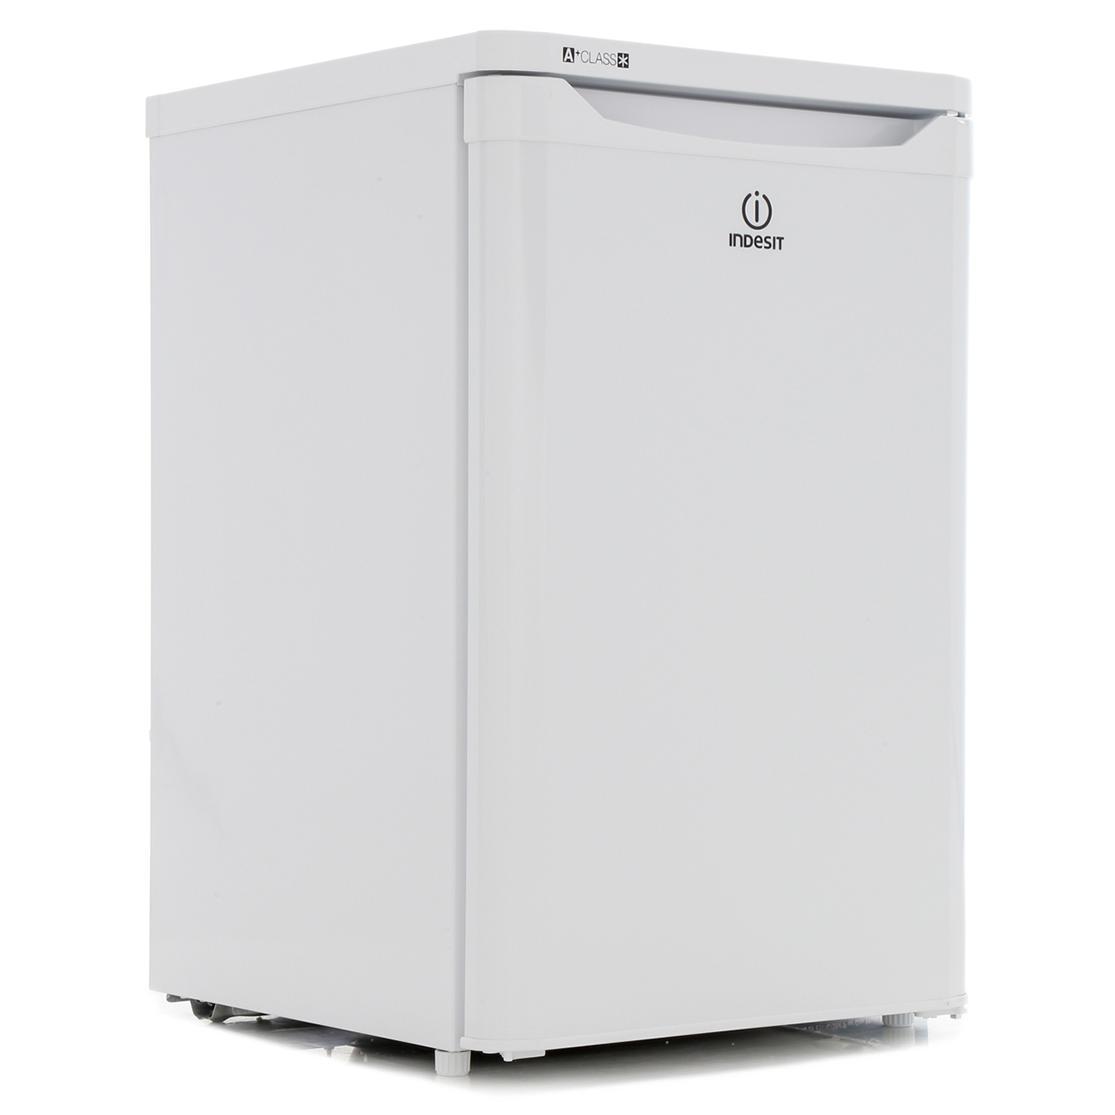 Indesit TFAA10 Fridge with Ice Box